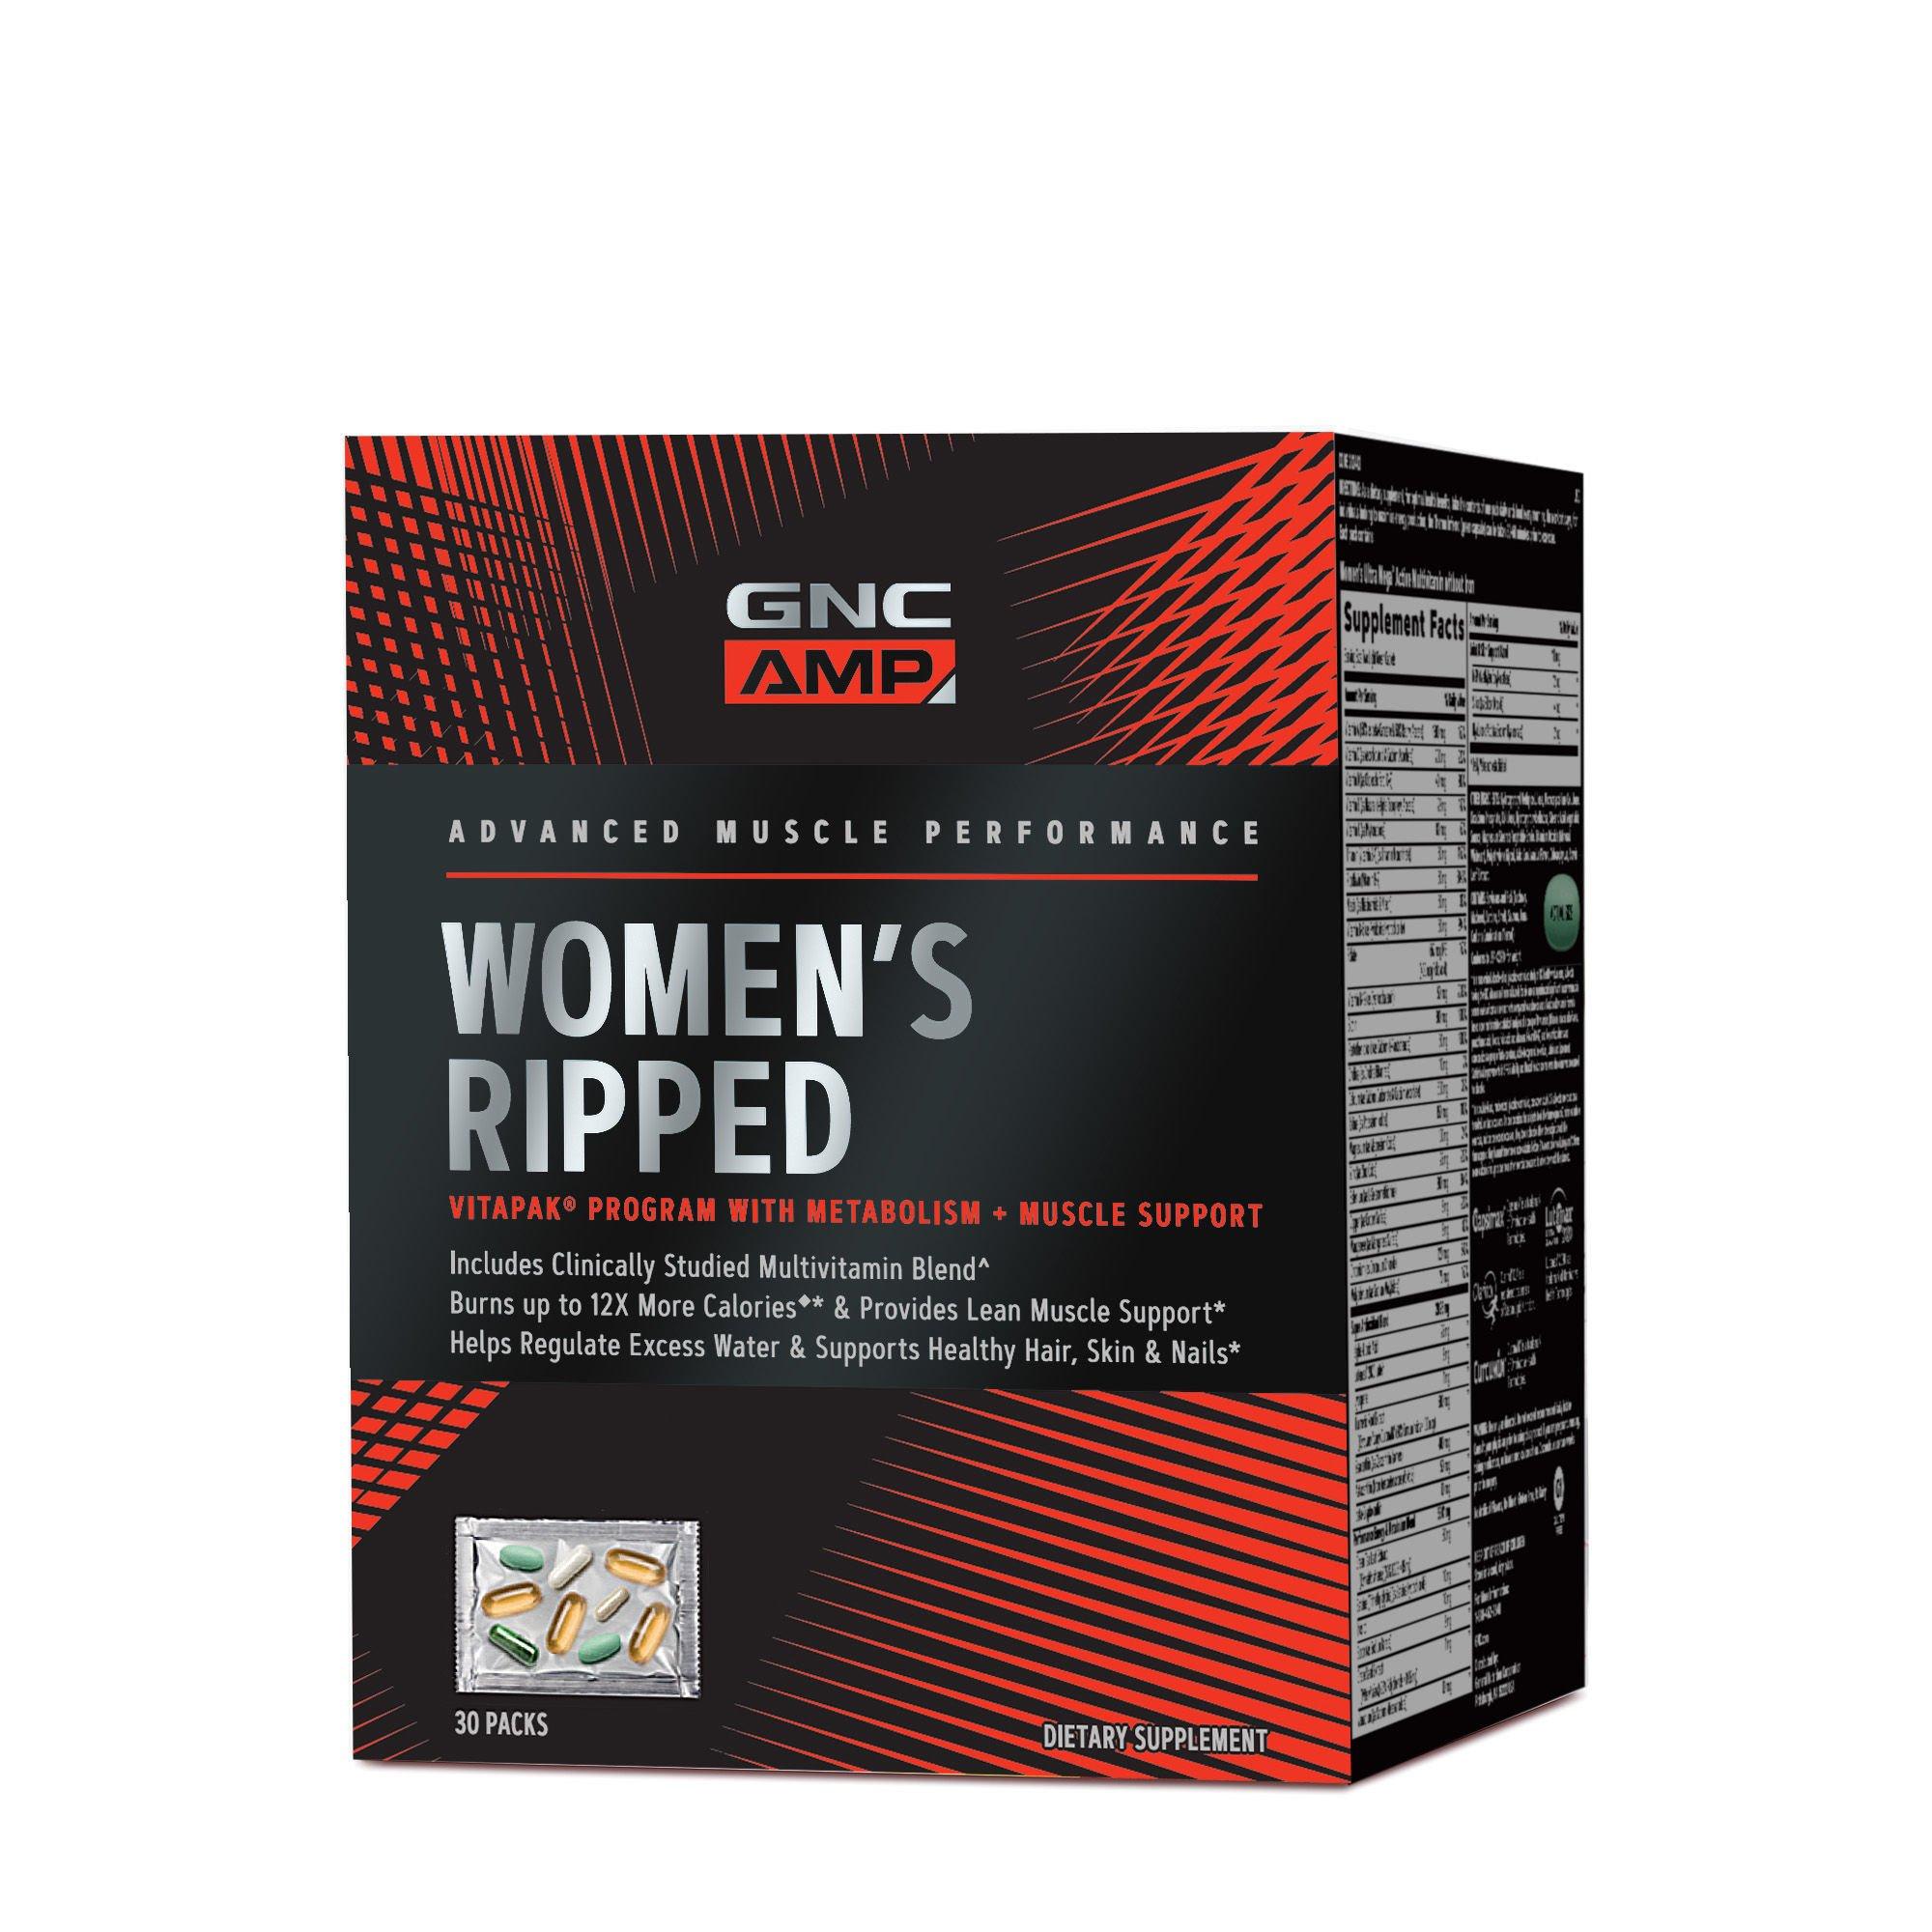 GNC Pro Performance AMP Womens Ripped Vitapak Program, 30 Packets